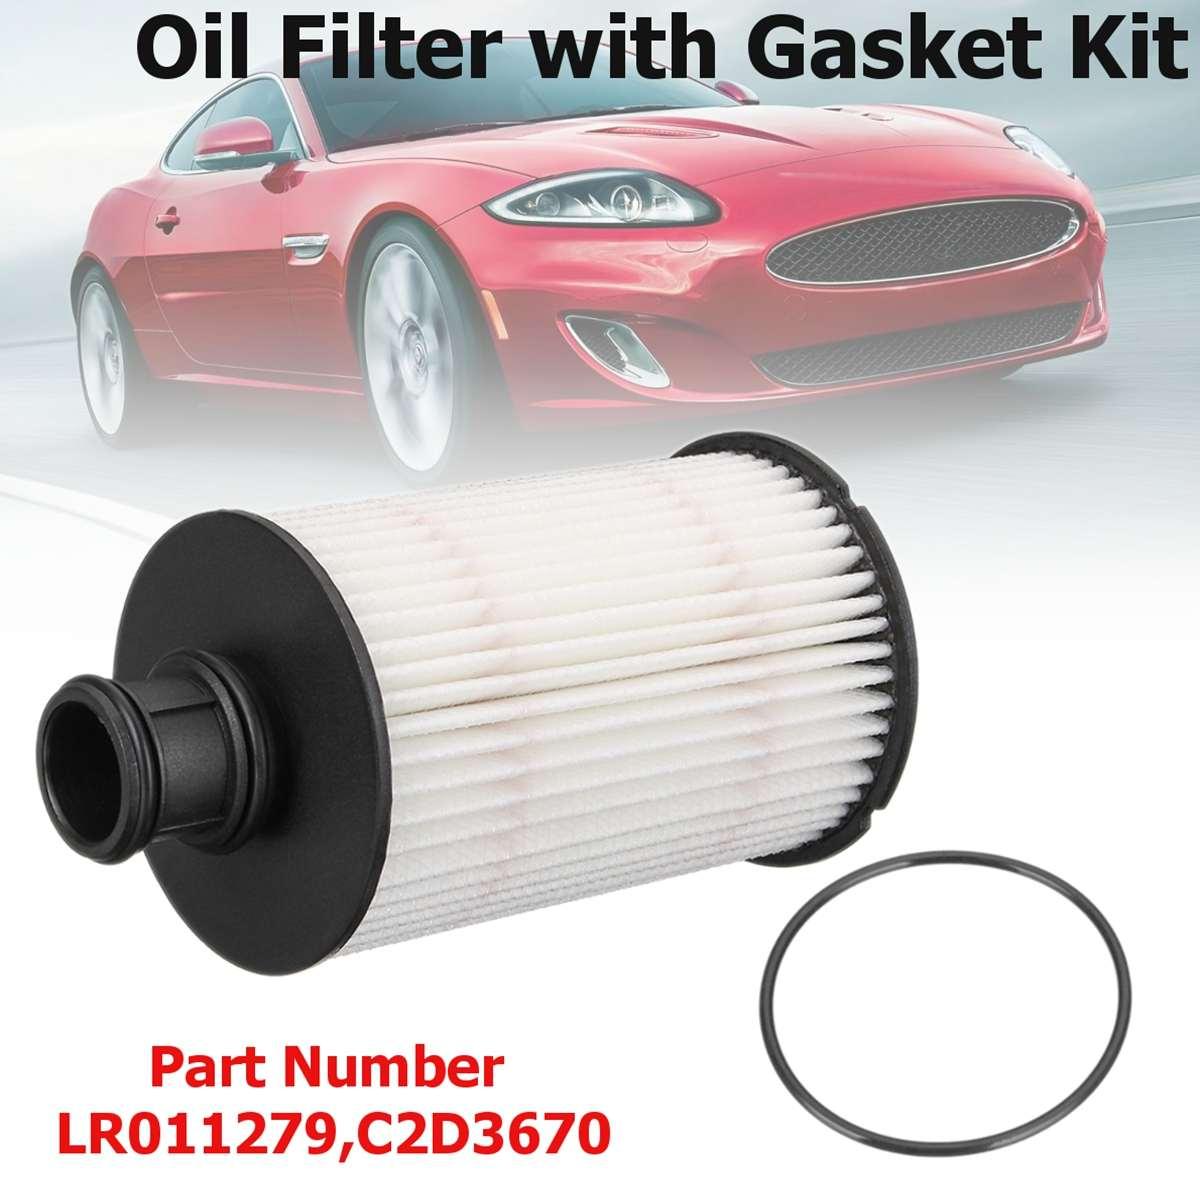 # LR011279,C2D3670 filtro de aceite de motor con Kit de junta para Jaguar XFR/XJR/XKR/f-type para Land Rover Range Rover Sport